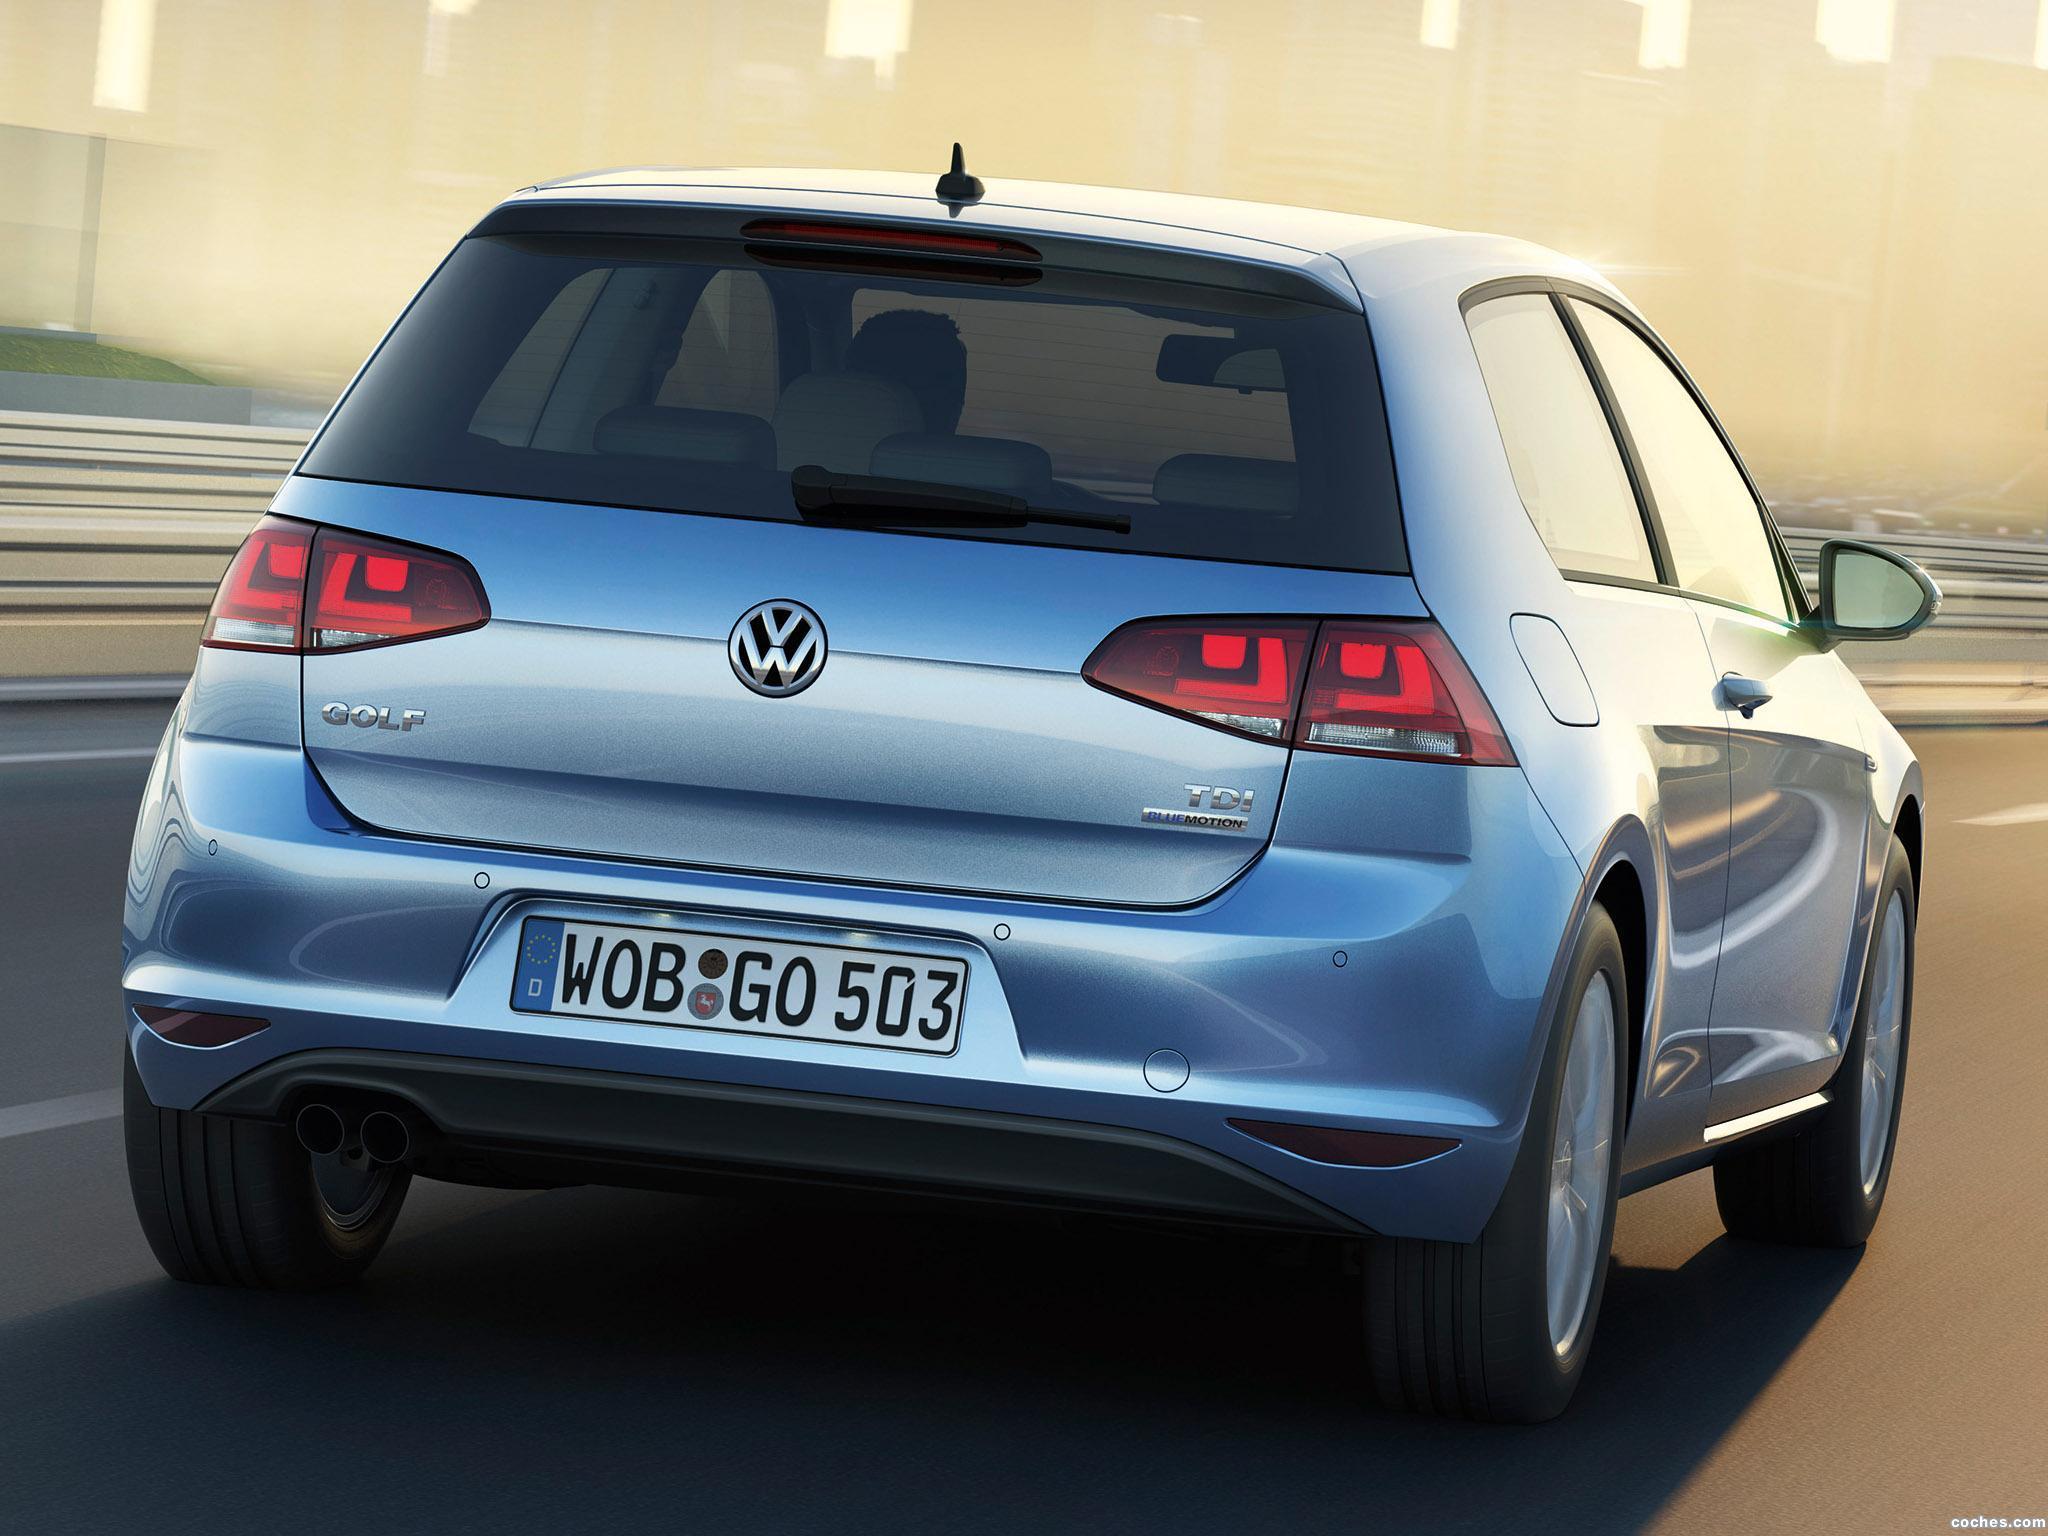 Foto 1 de Volkswagen Golf 3 puertas TGI BlueMotion 2013